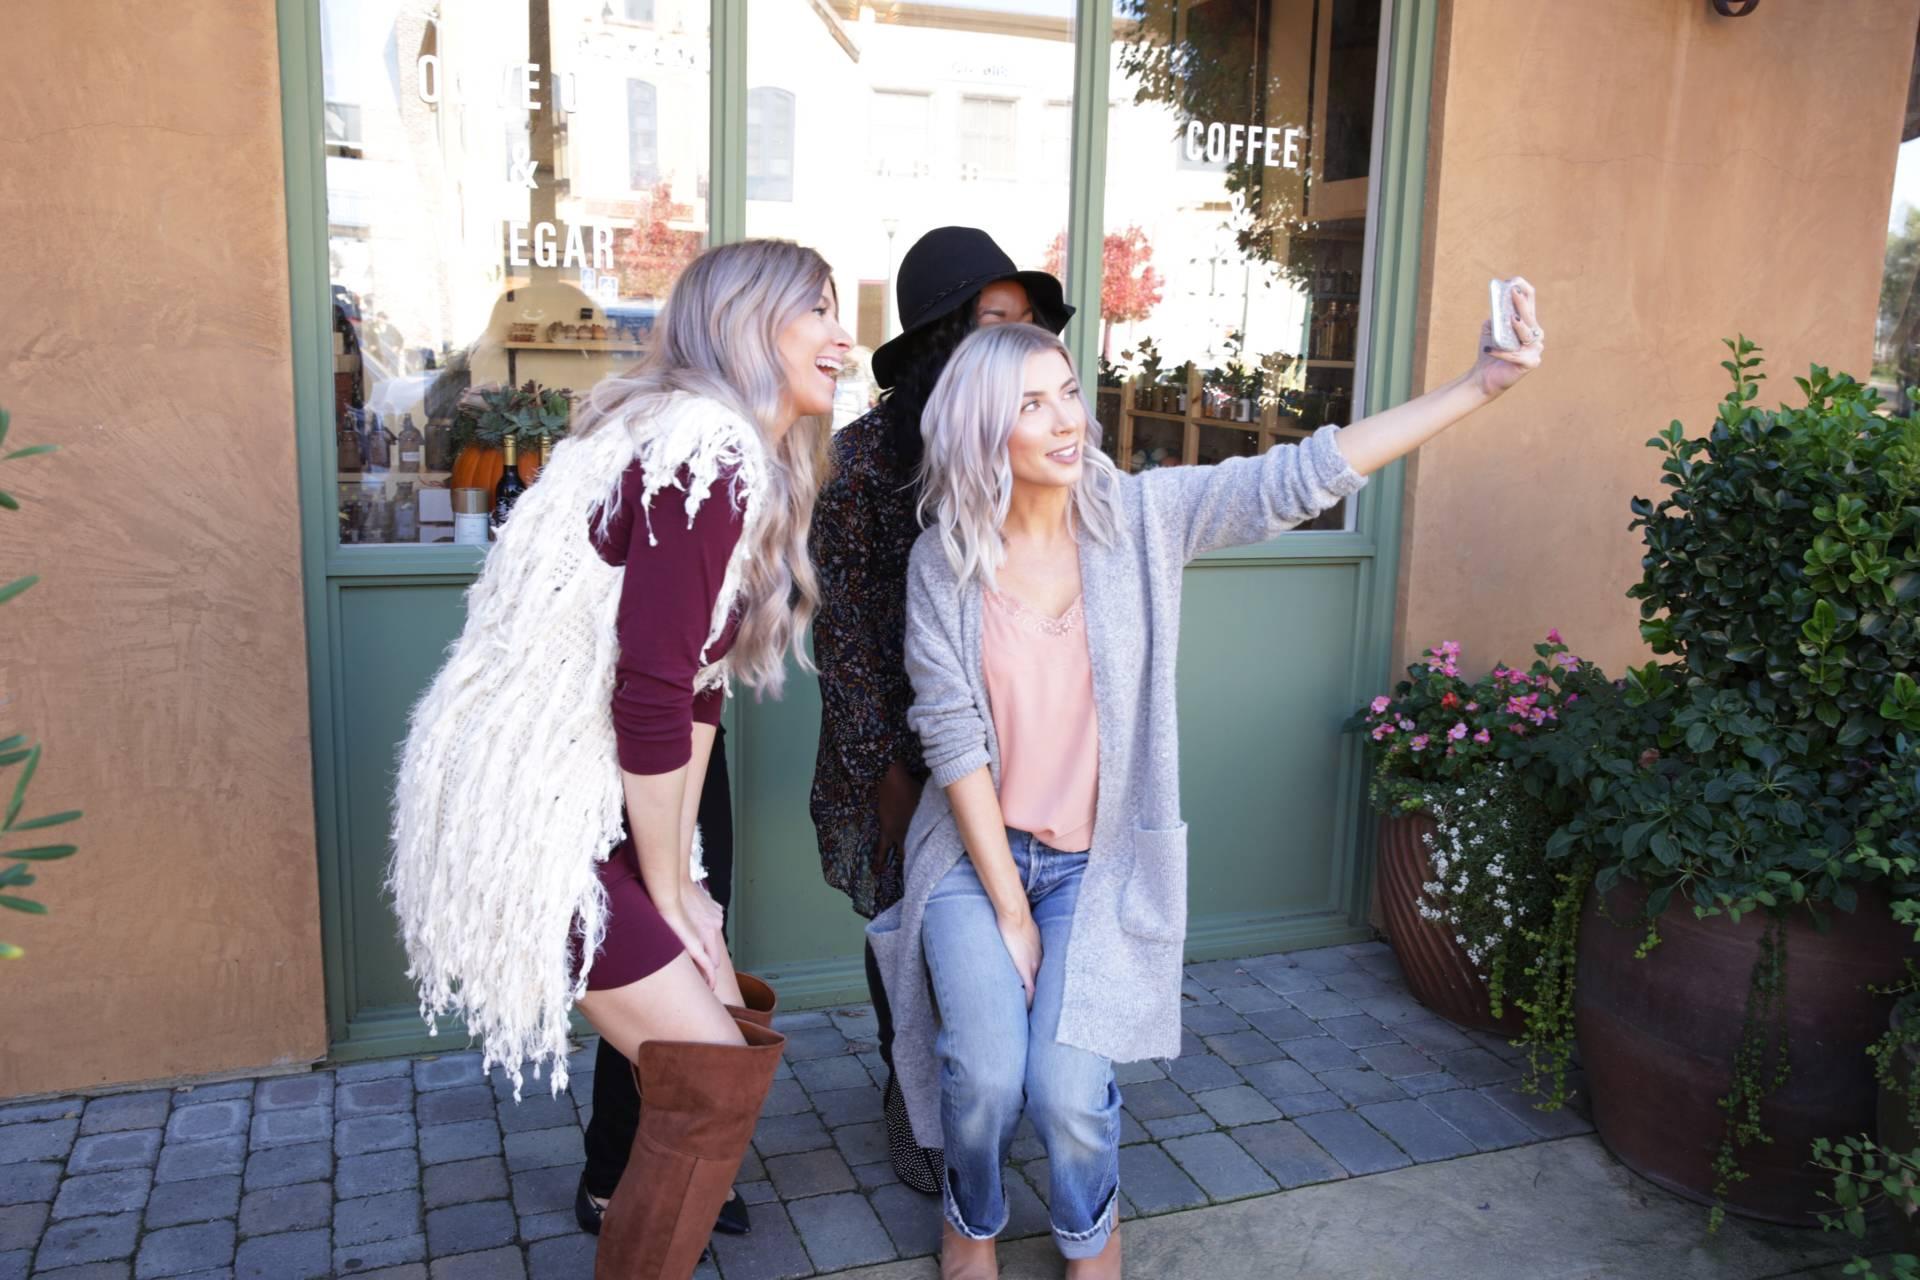 fashion-blogger-closet-sale-teaoxics-re-cap- blog